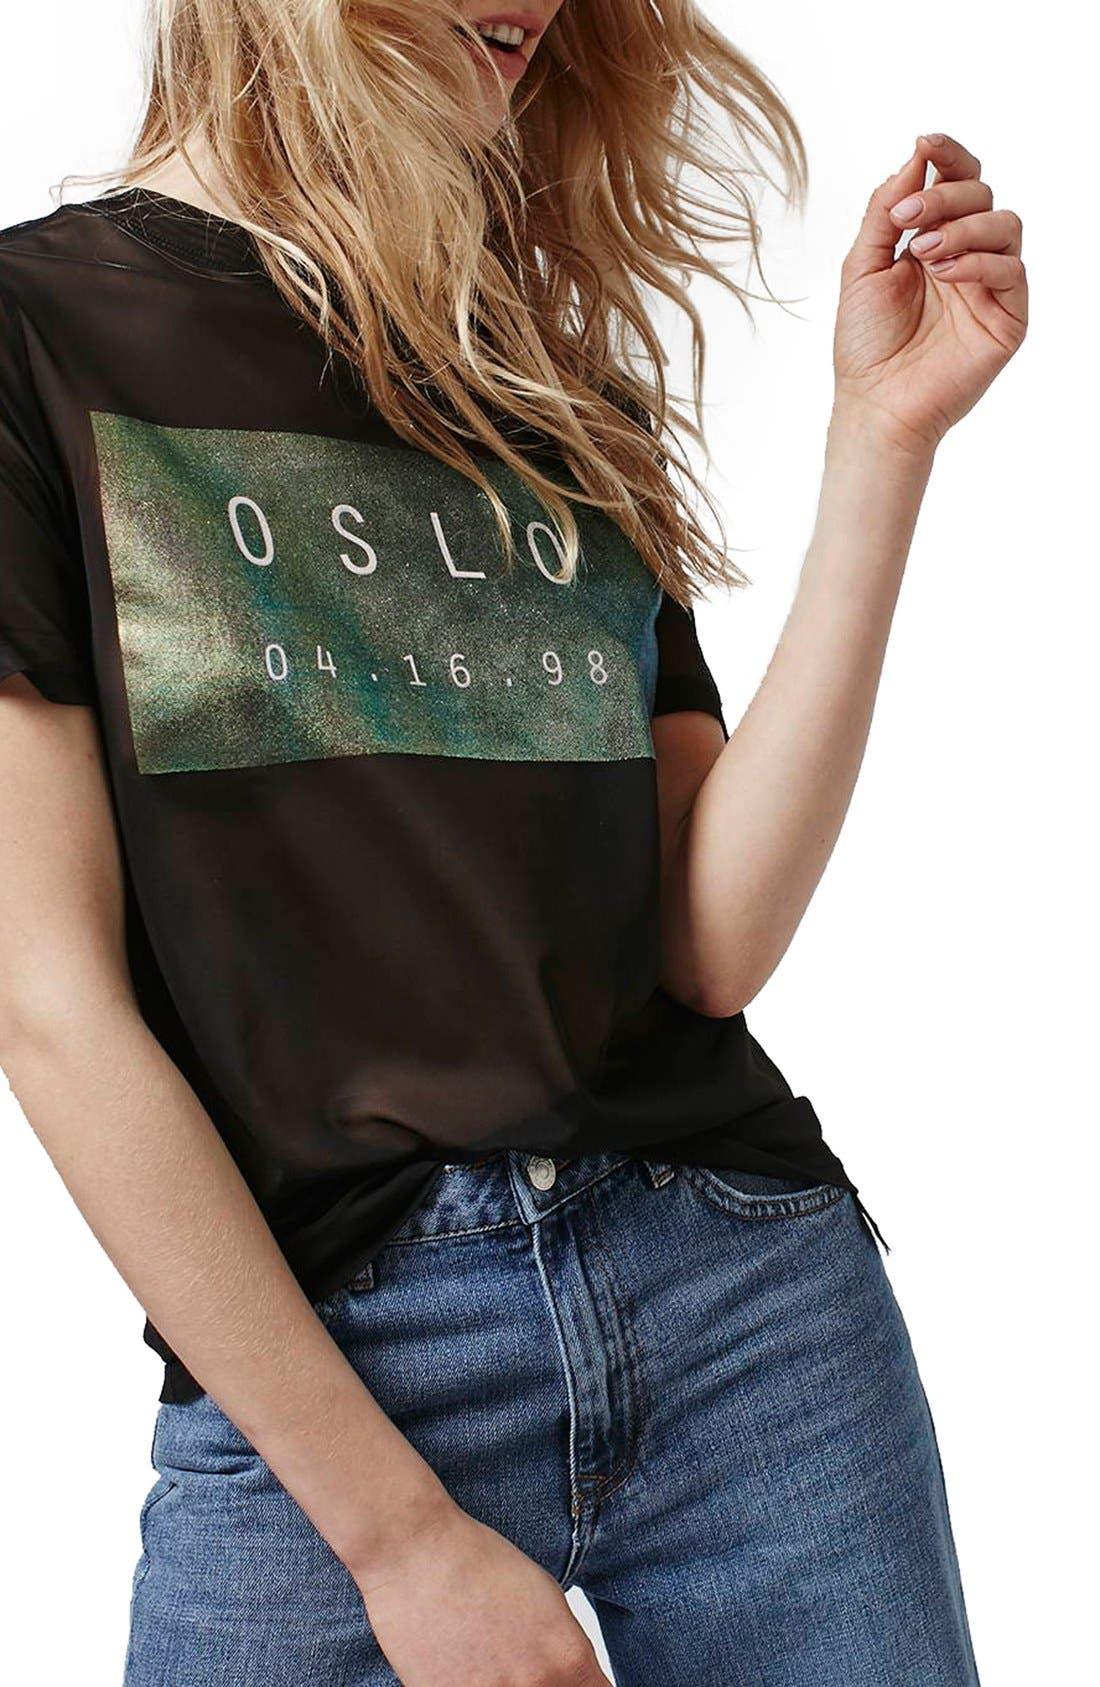 Main Image - Topshop 'Oslo' Holographic Sheer Mesh Tee